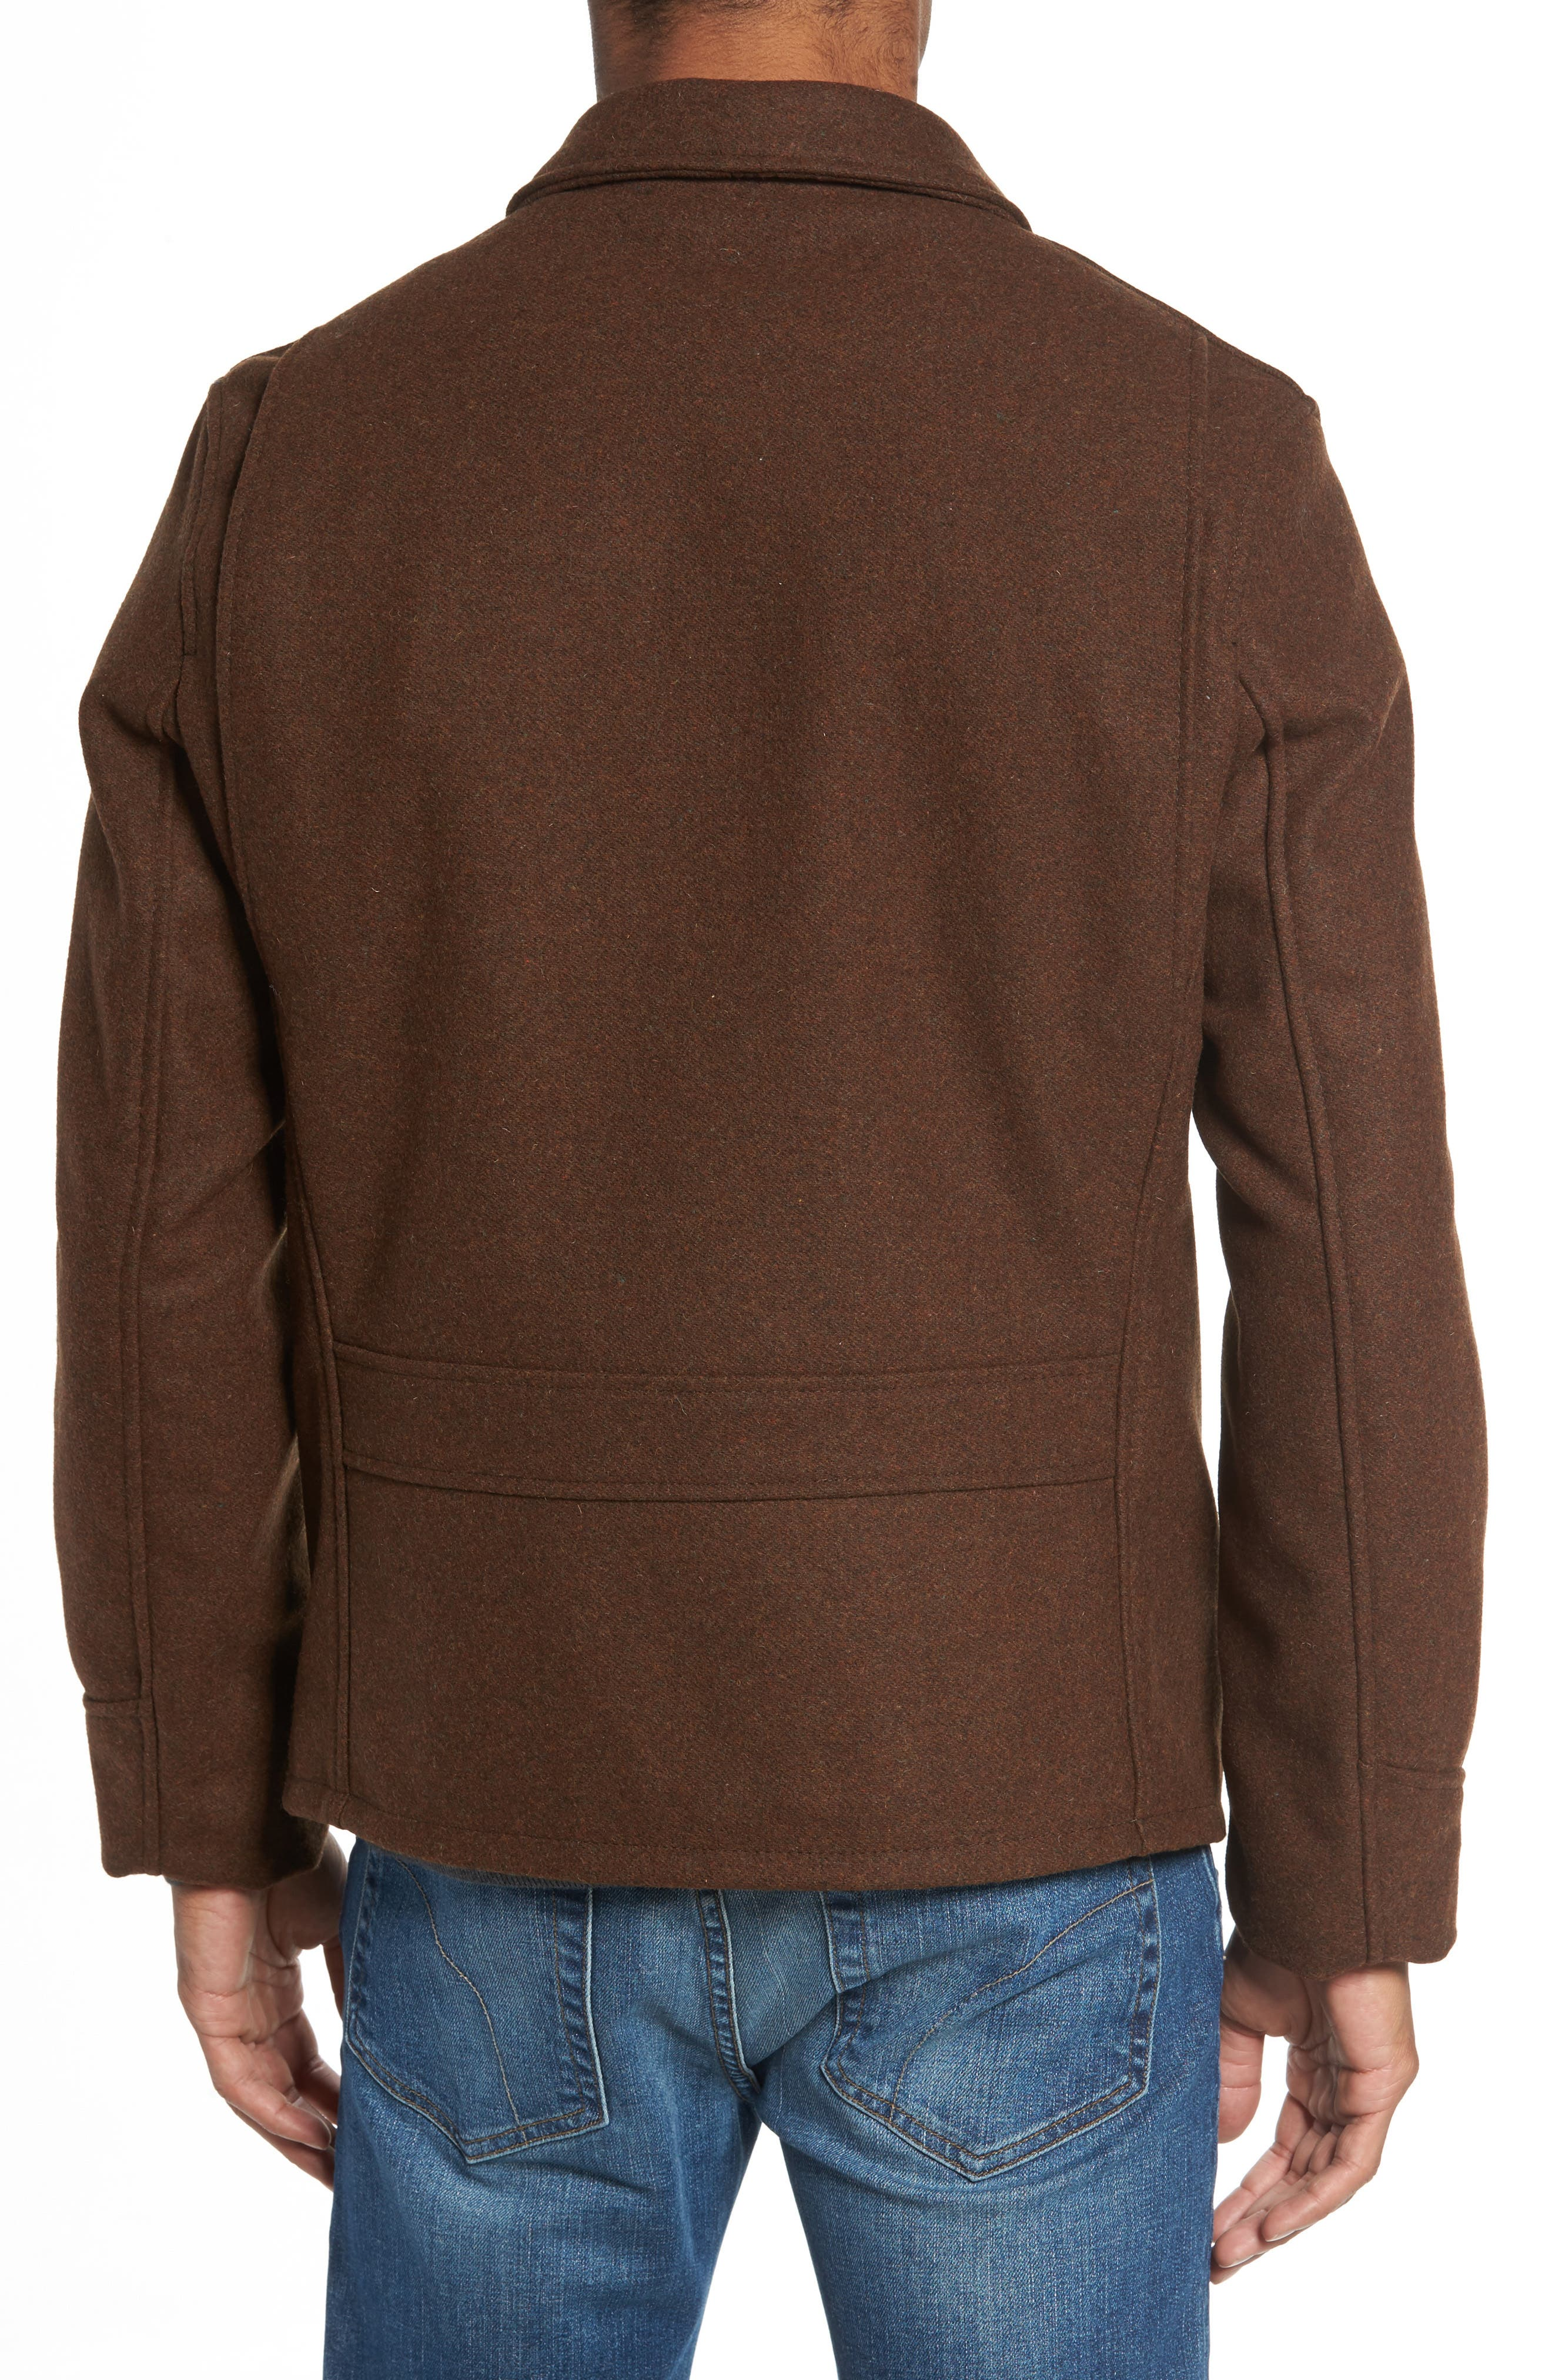 Liberty Wool Blend Zip Front Jacket,                             Alternate thumbnail 2, color,                             200